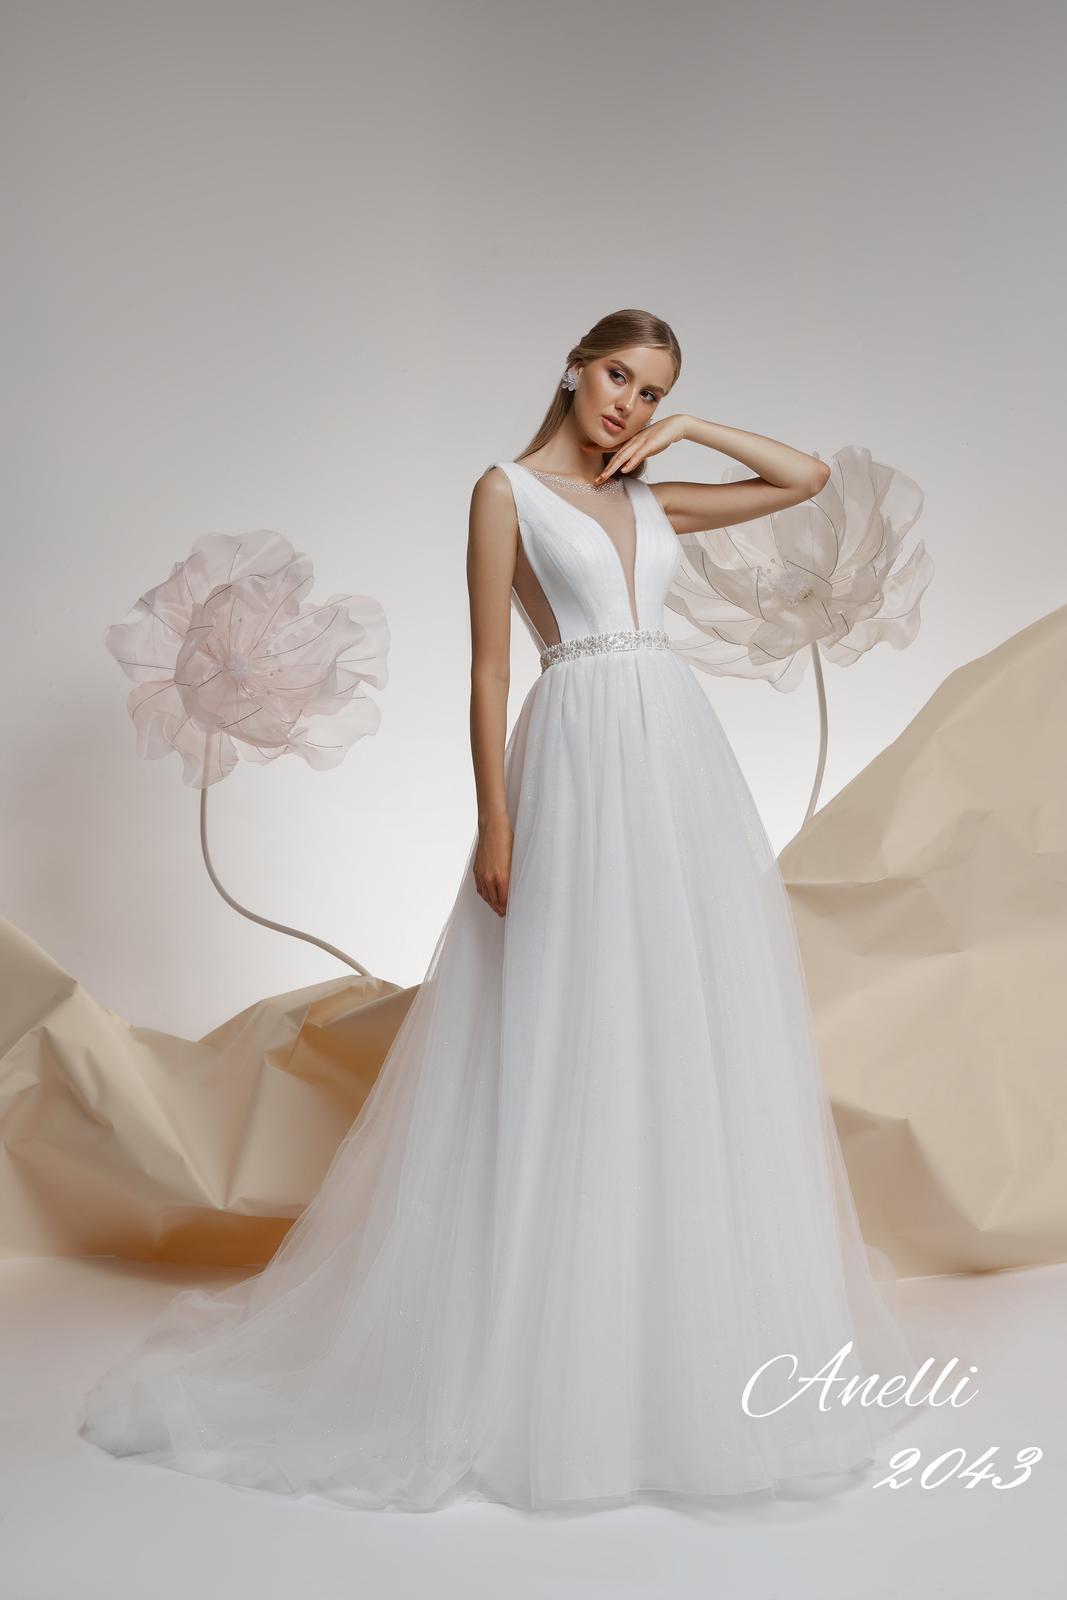 Svadobné šaty - Imagine 2043 - Obrázok č. 2